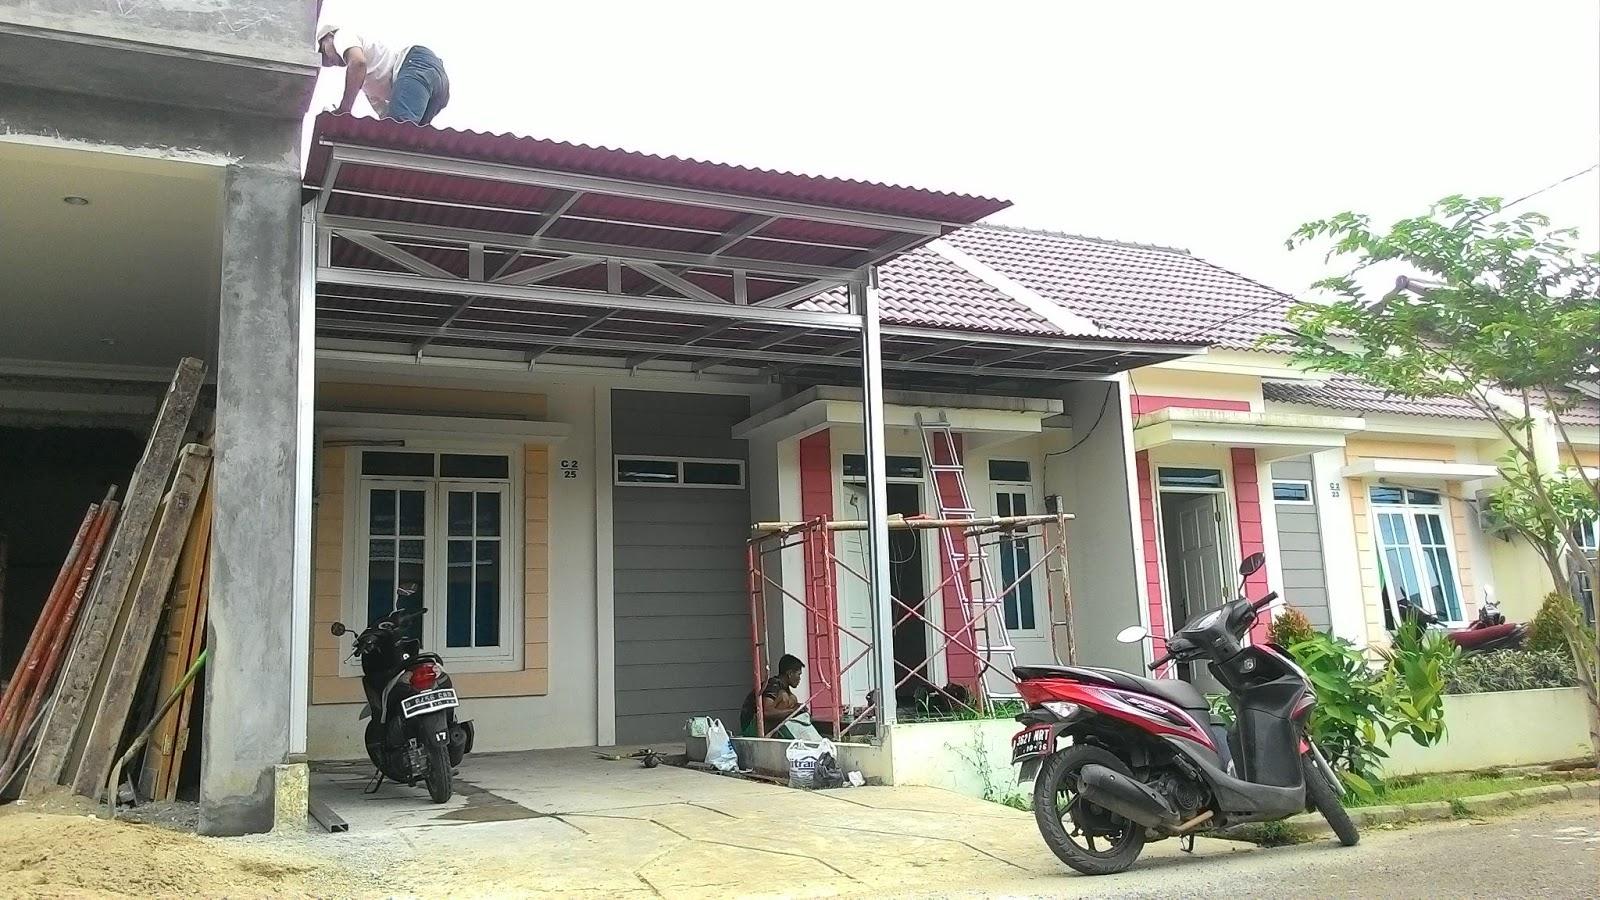 Kanopi Baja Ringan Taso No 1 Semarang 0857 1231 6995 0823 2608 8264